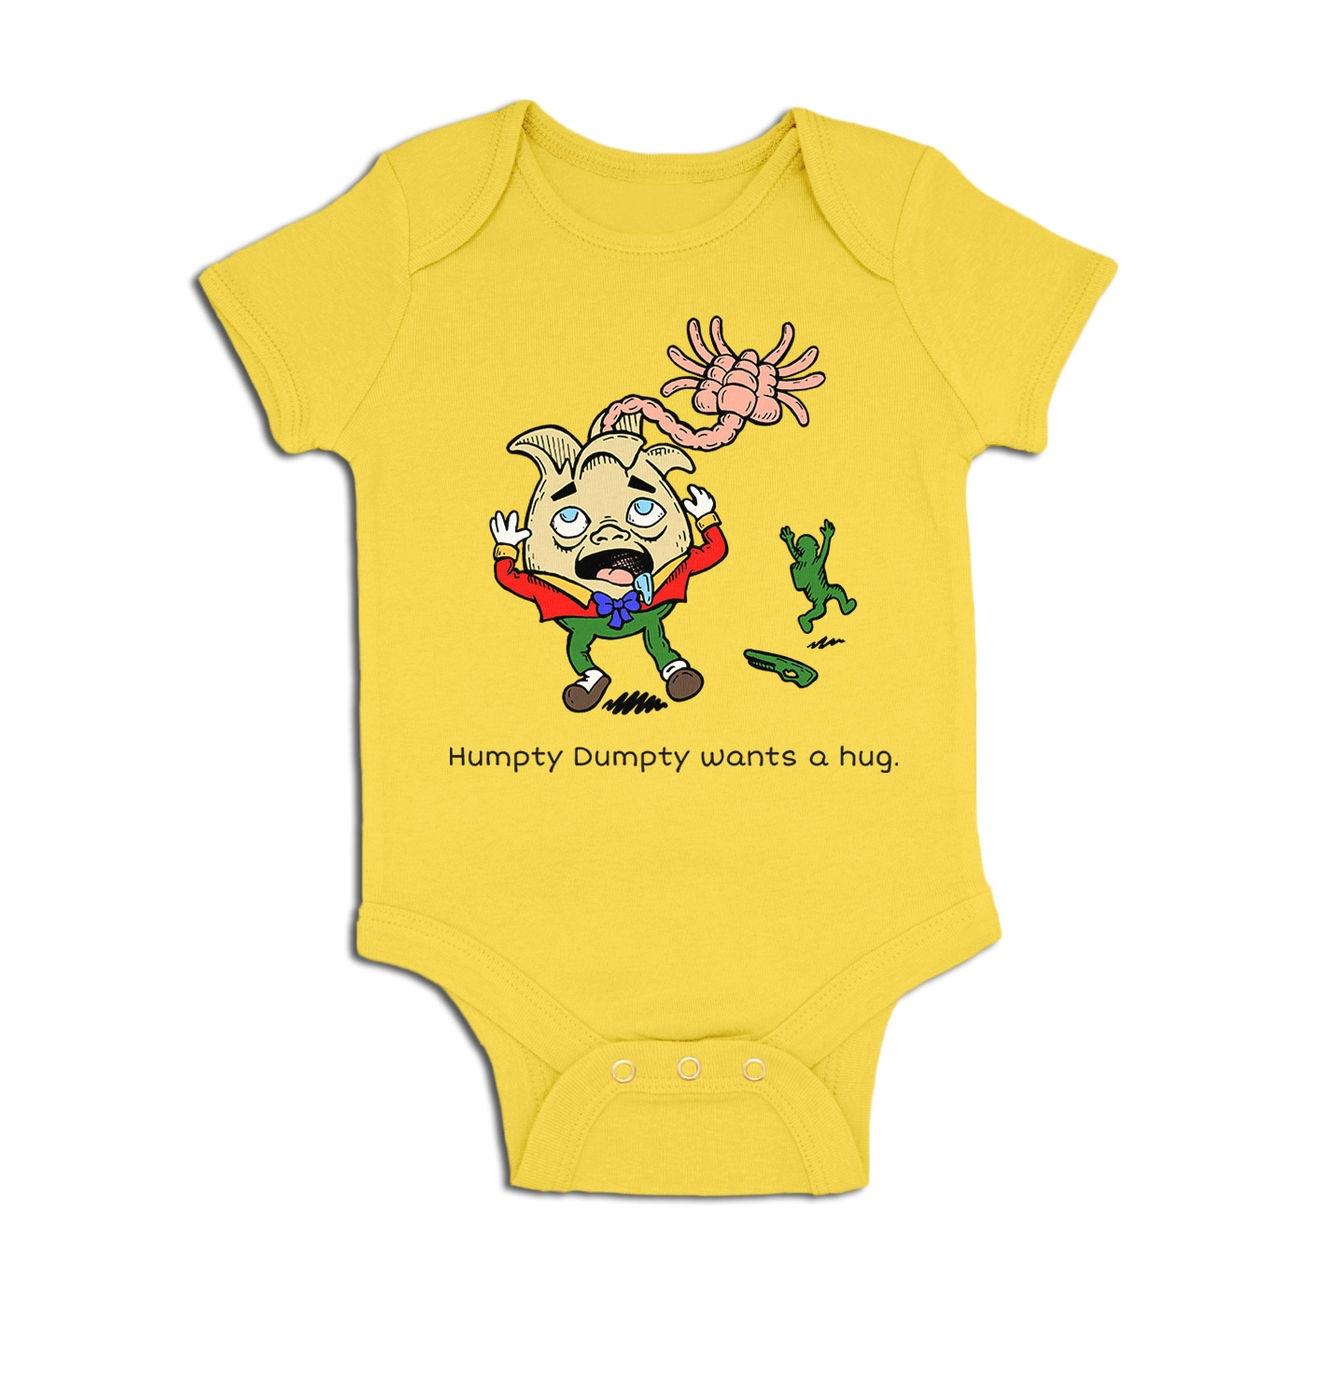 Humpty Dumpty Wants A Hug baby grow by Something Geeky